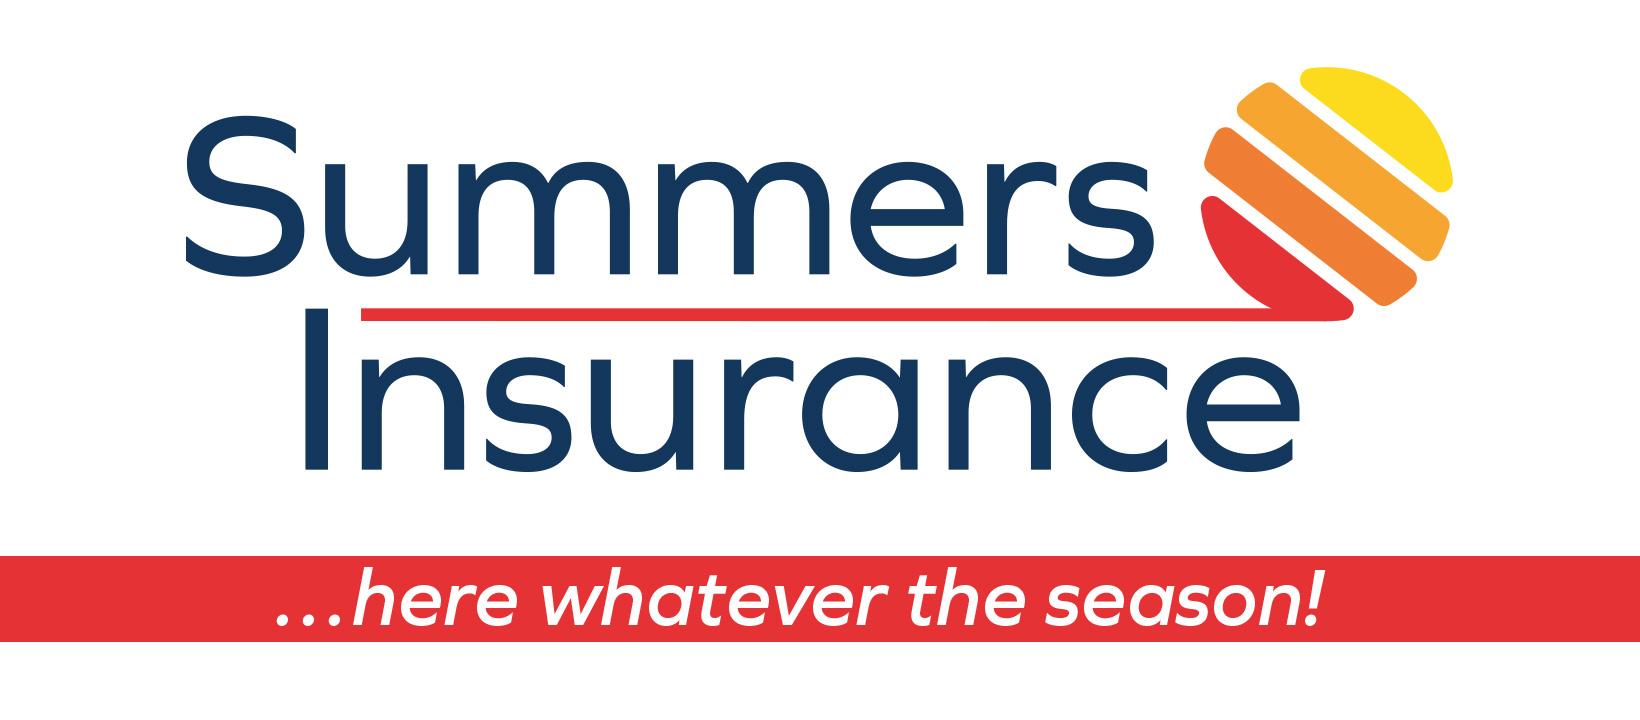 Summers Insurance logo